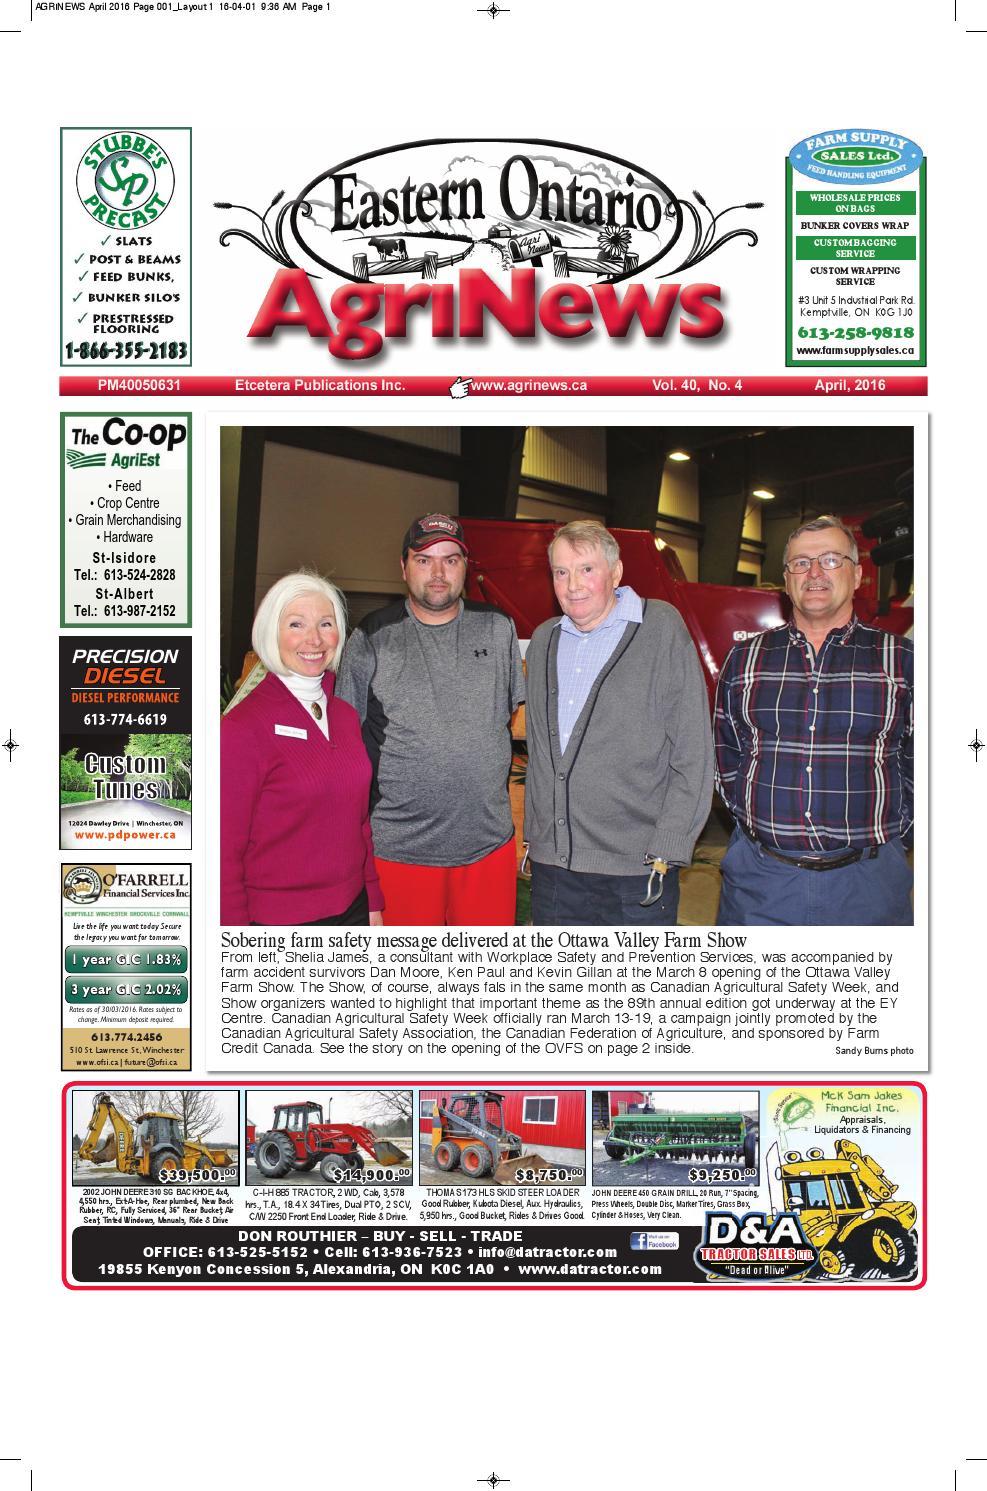 Pub Leclerc Drive Frais Agrinews April 2016 by Robin Morris issuu